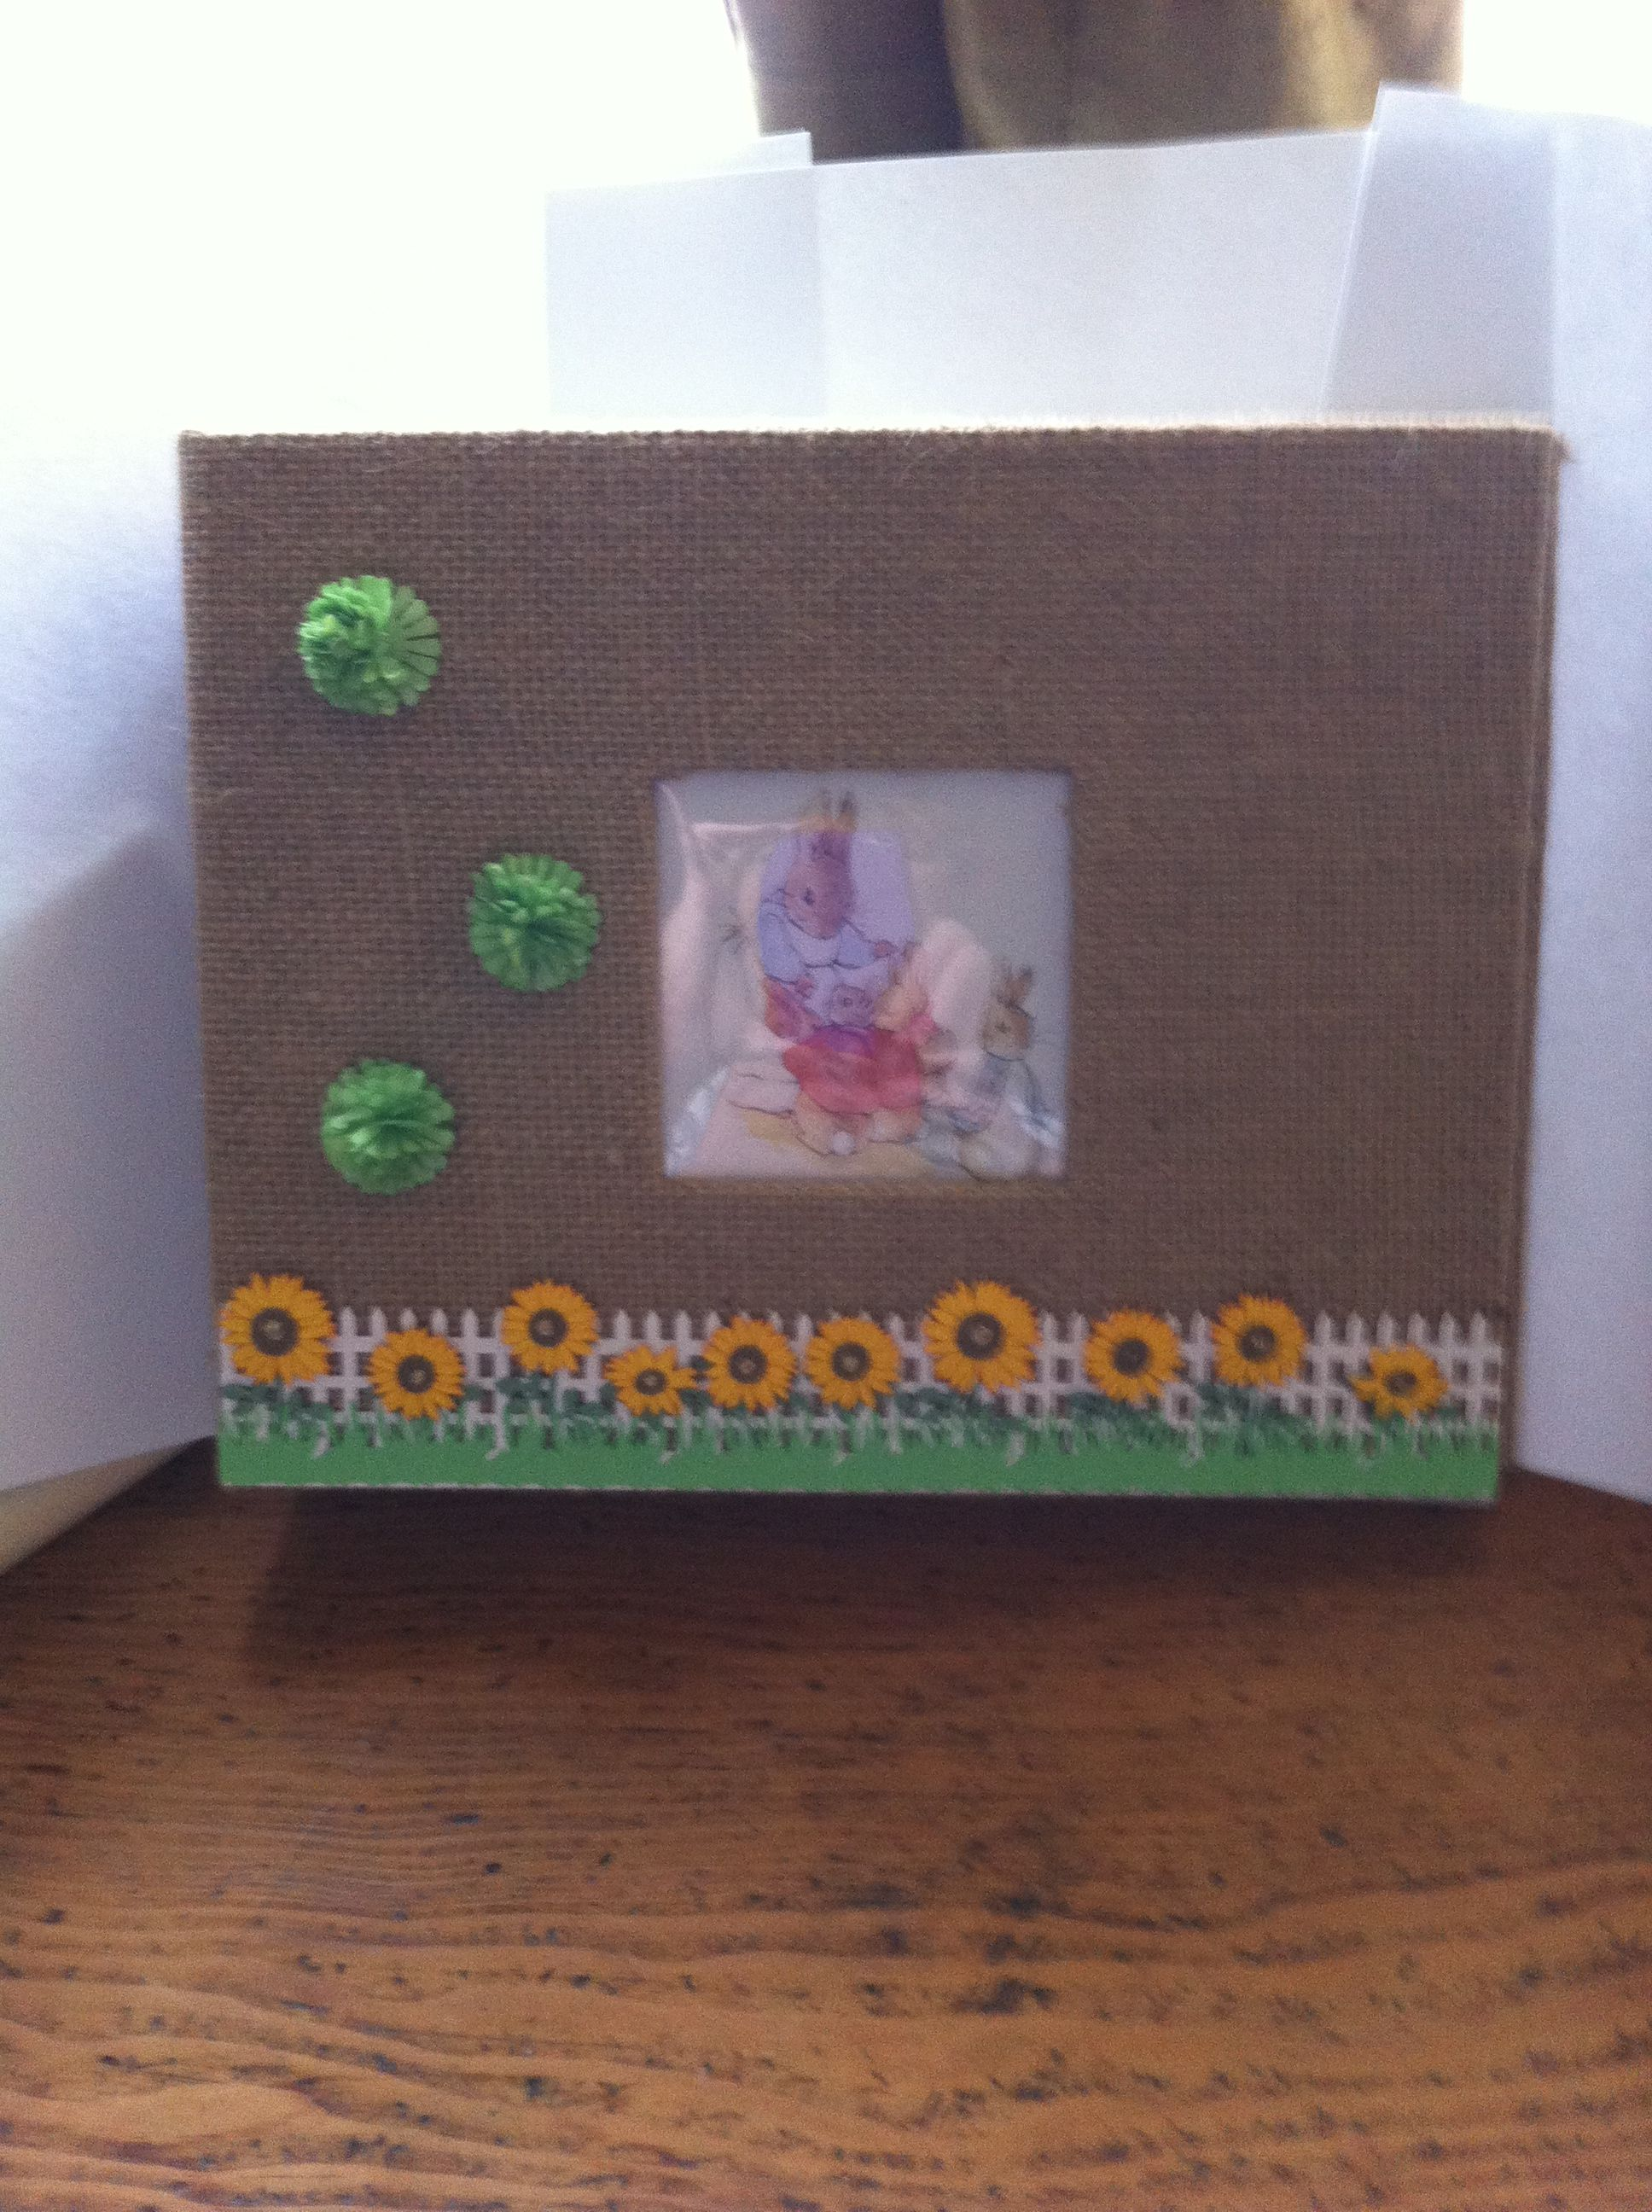 Plain Burlap Photoscrapbook Decorated For Peter Rabbit Themed Baby